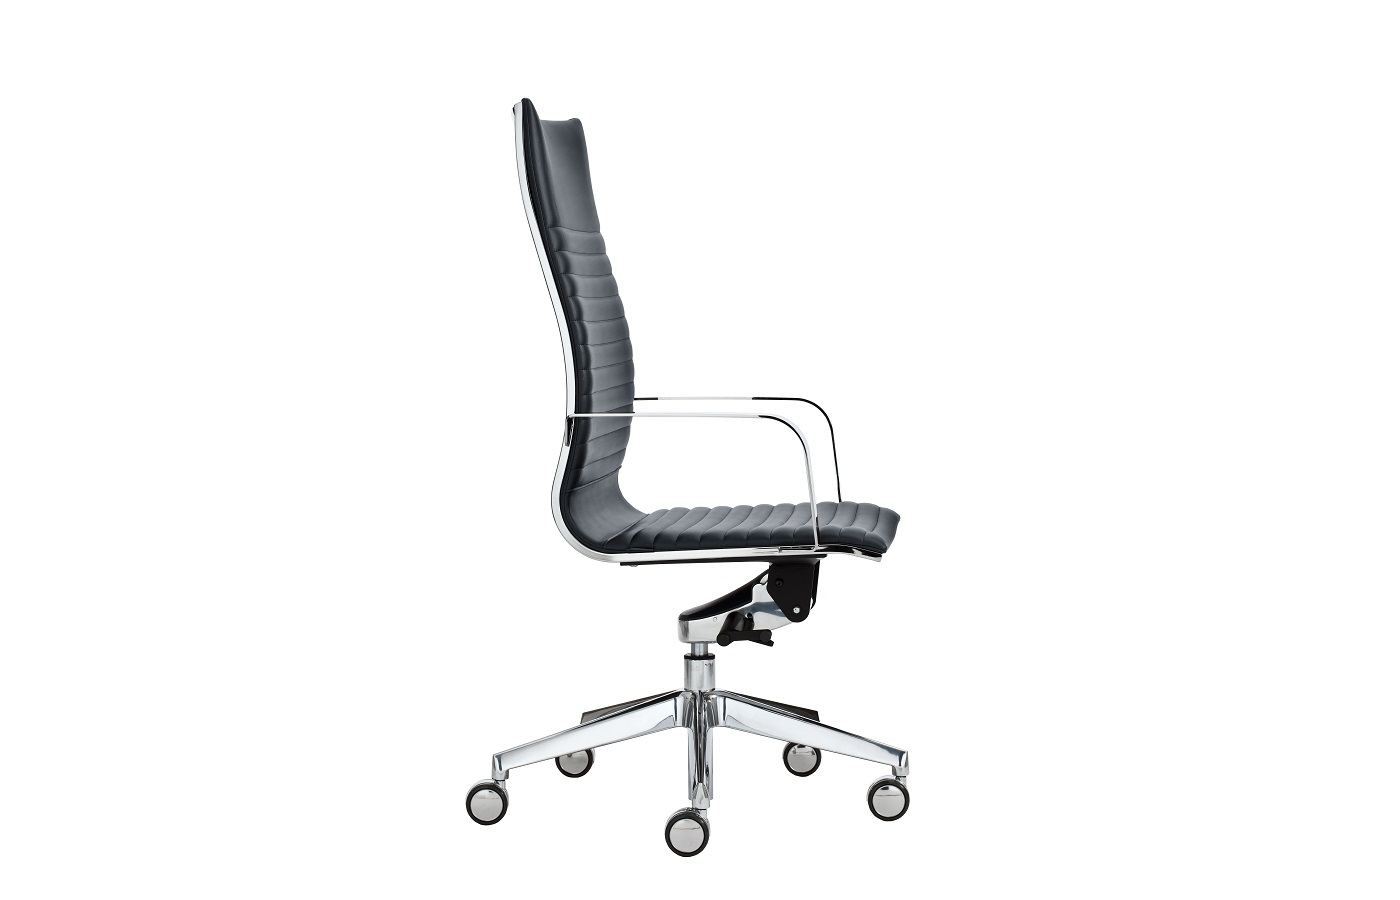 Kruna seduta direzionale per ufficio - riganelli